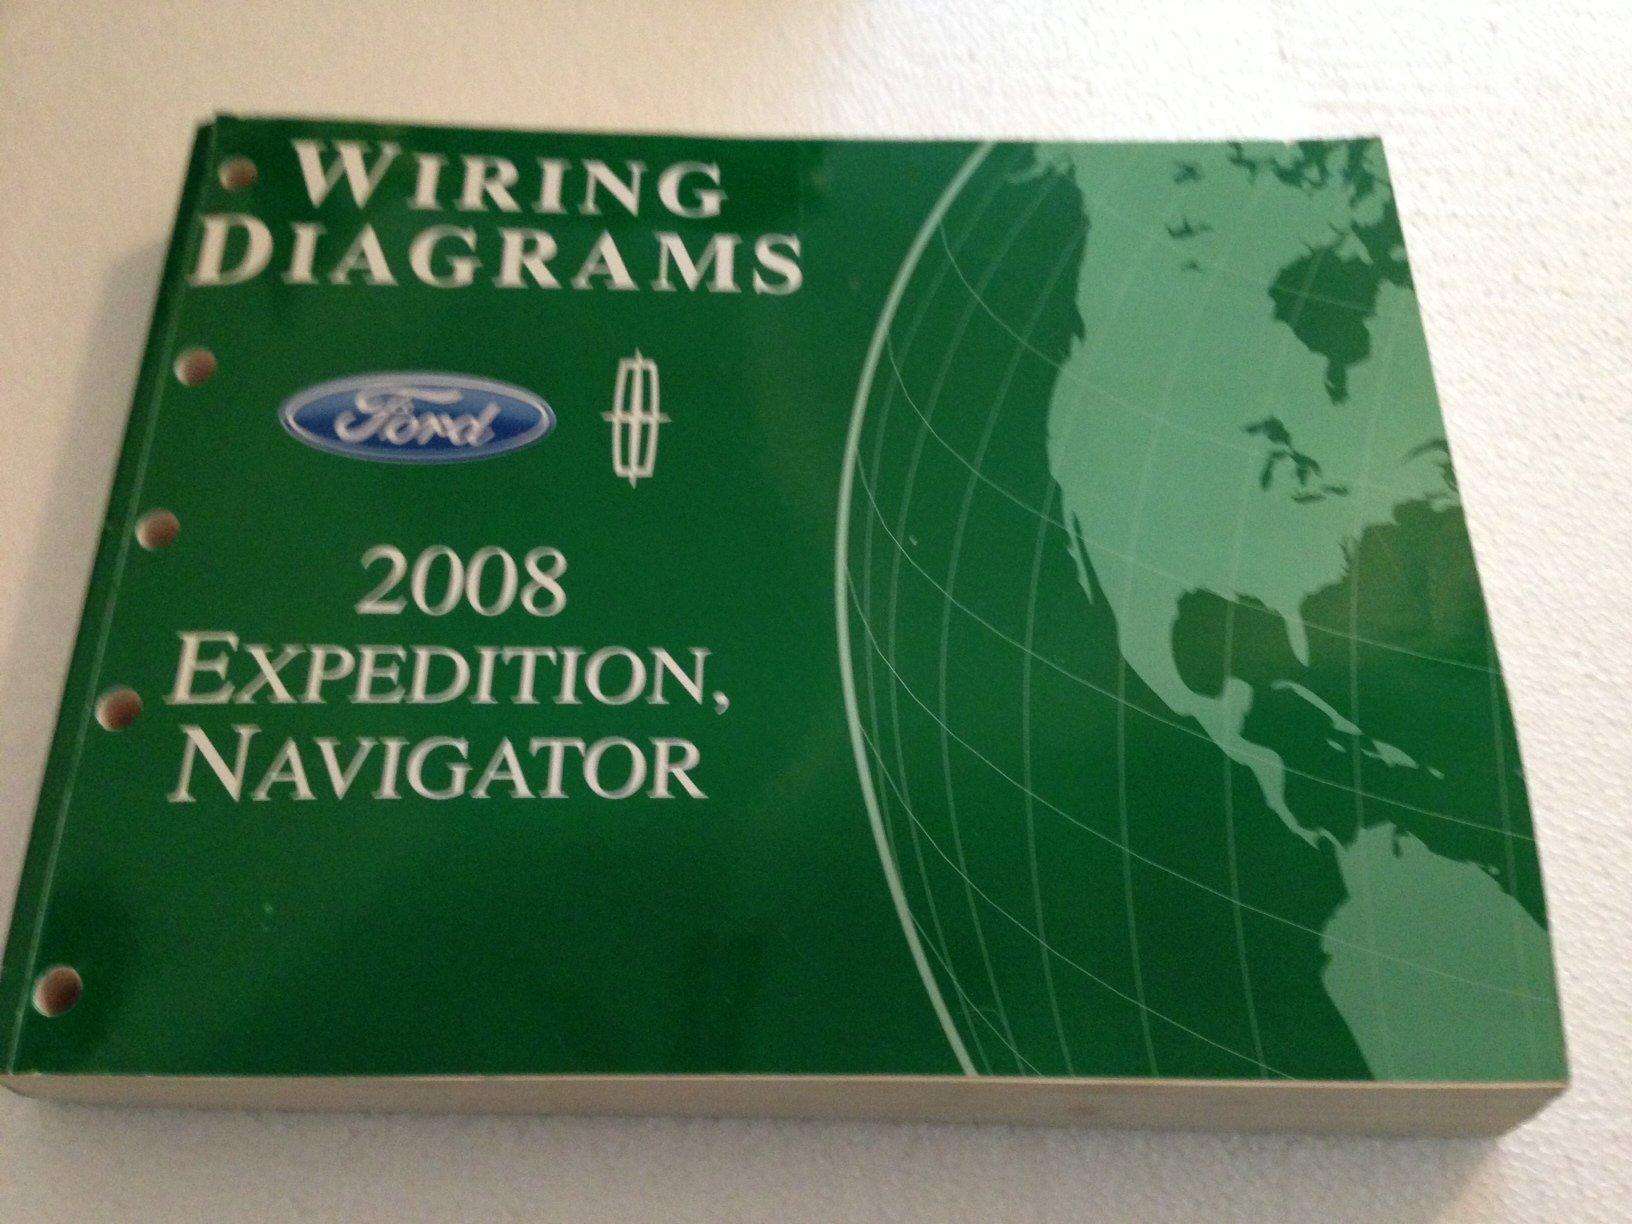 2008 ford expedition lincoln navigator wiring diagram manual original: ford:  amazon.com: books  amazon.com